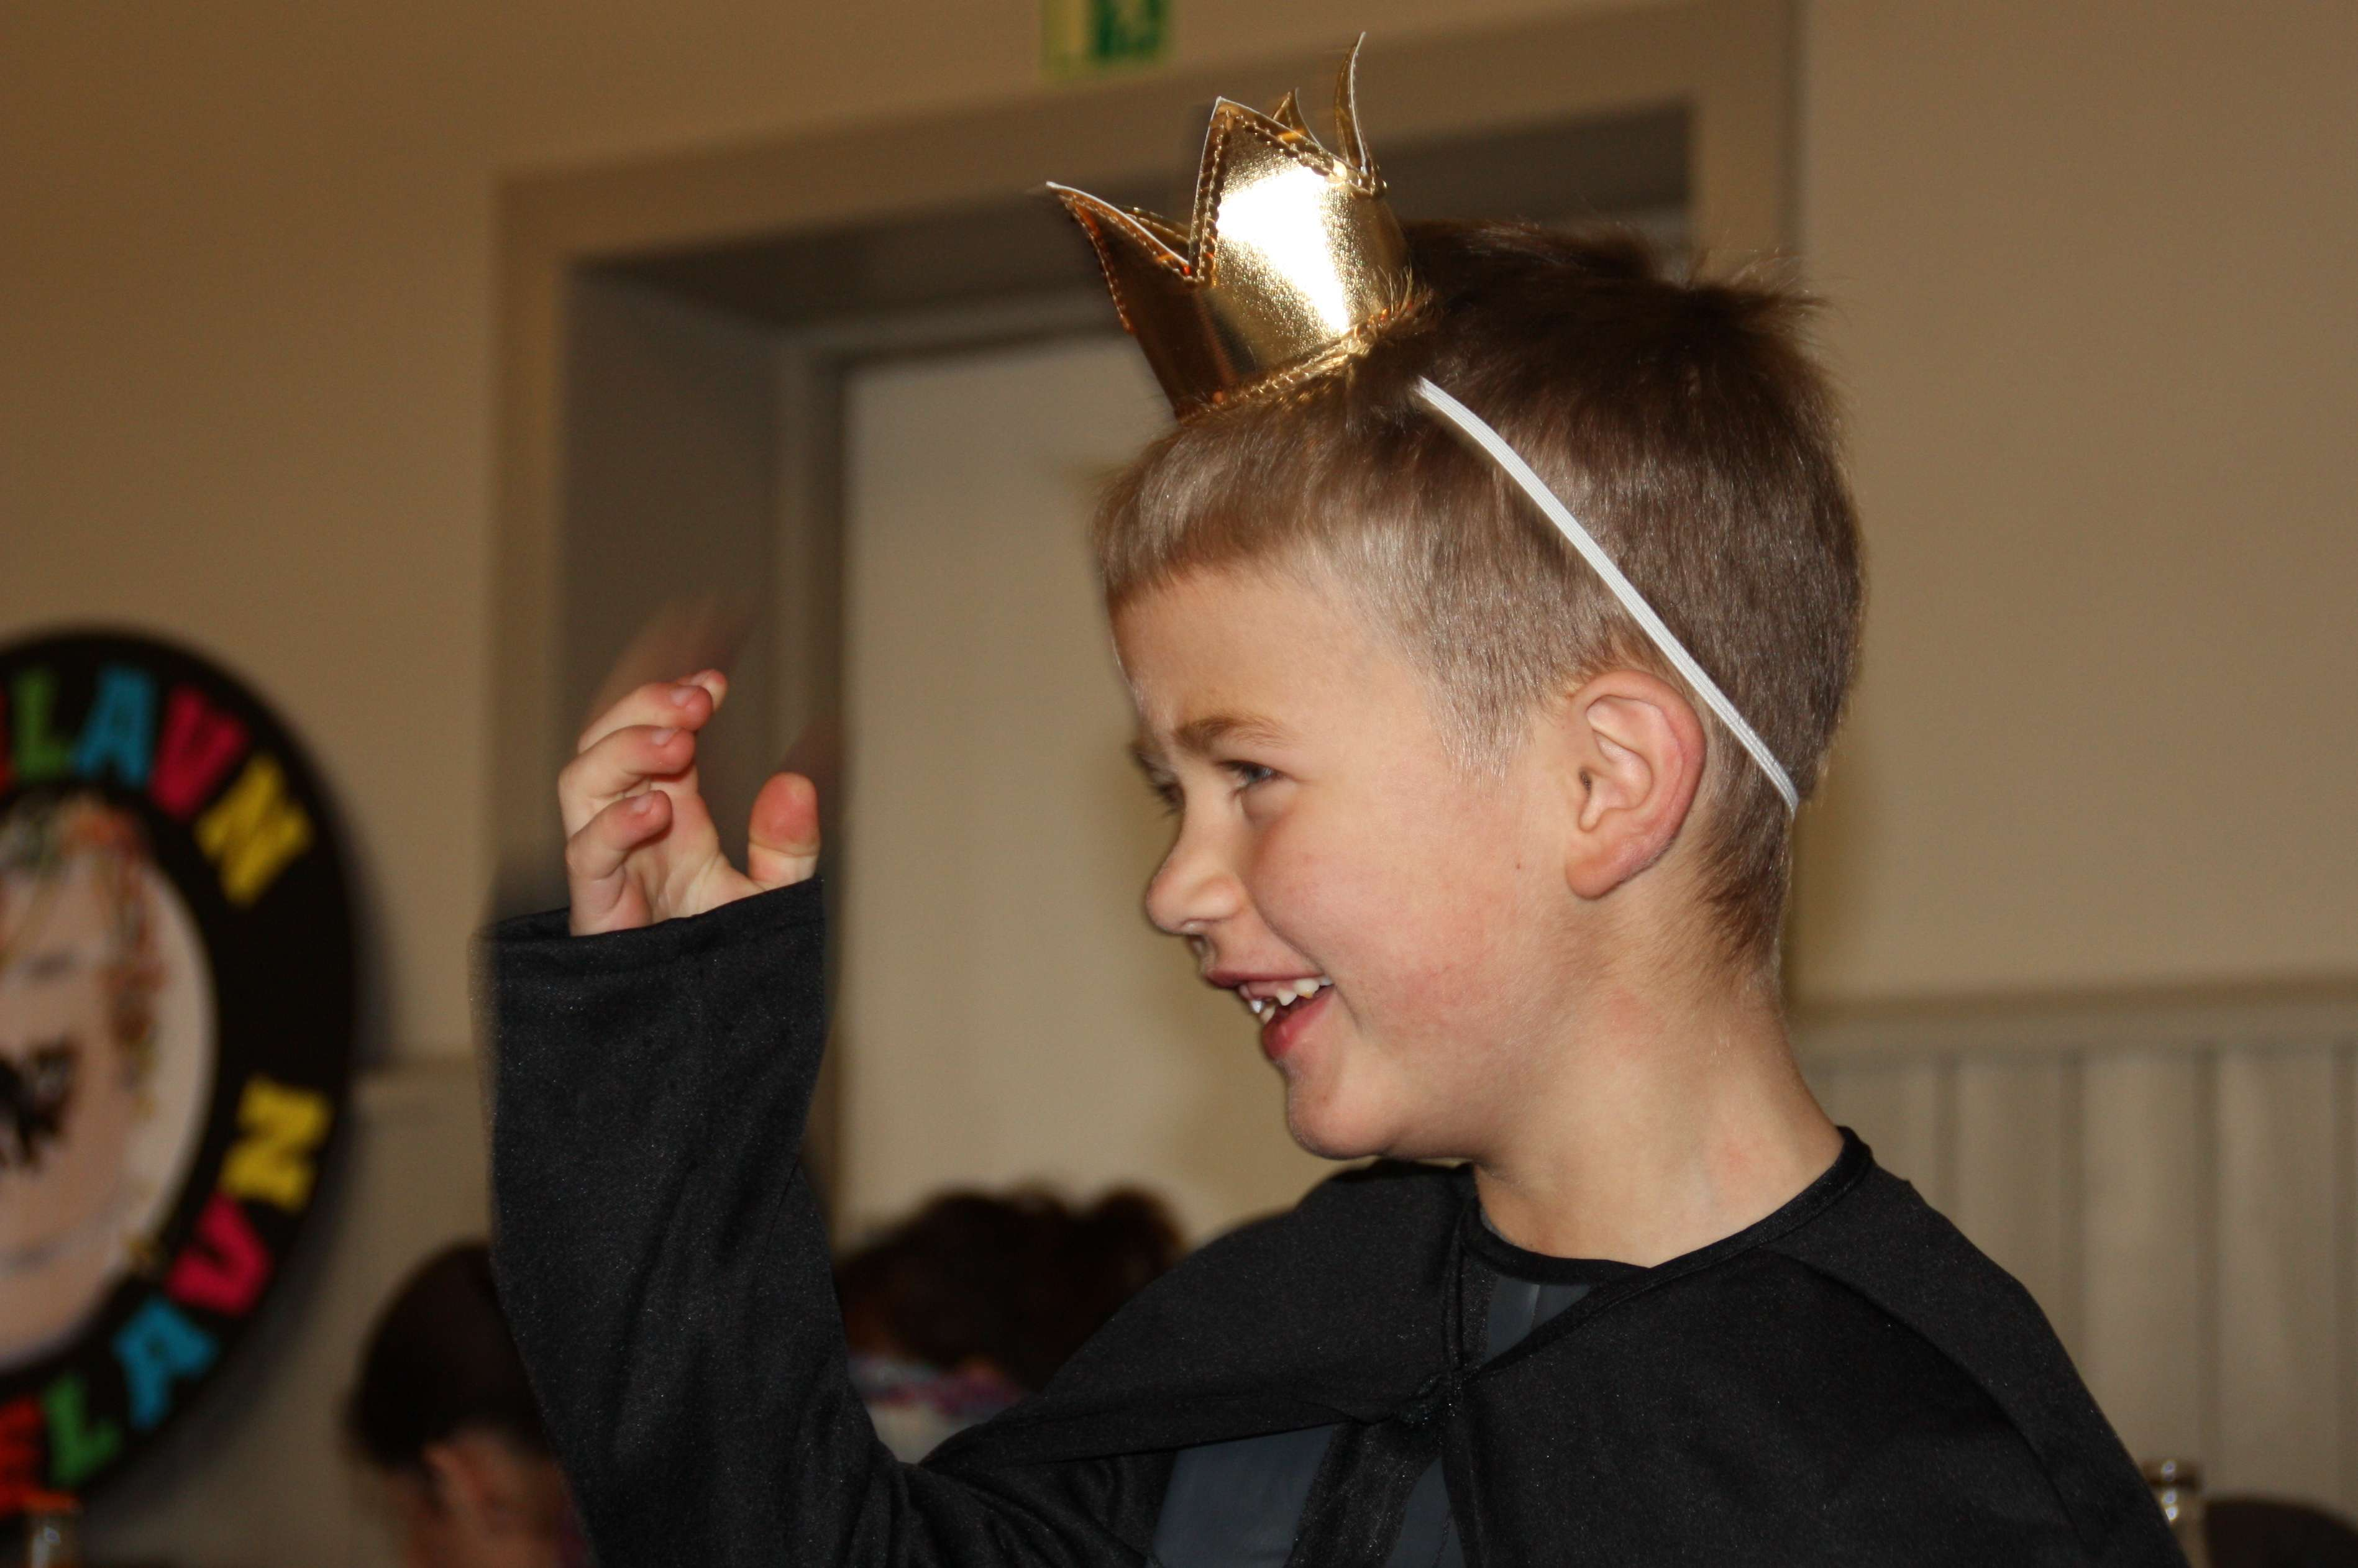 Dronning for de store: Lucas